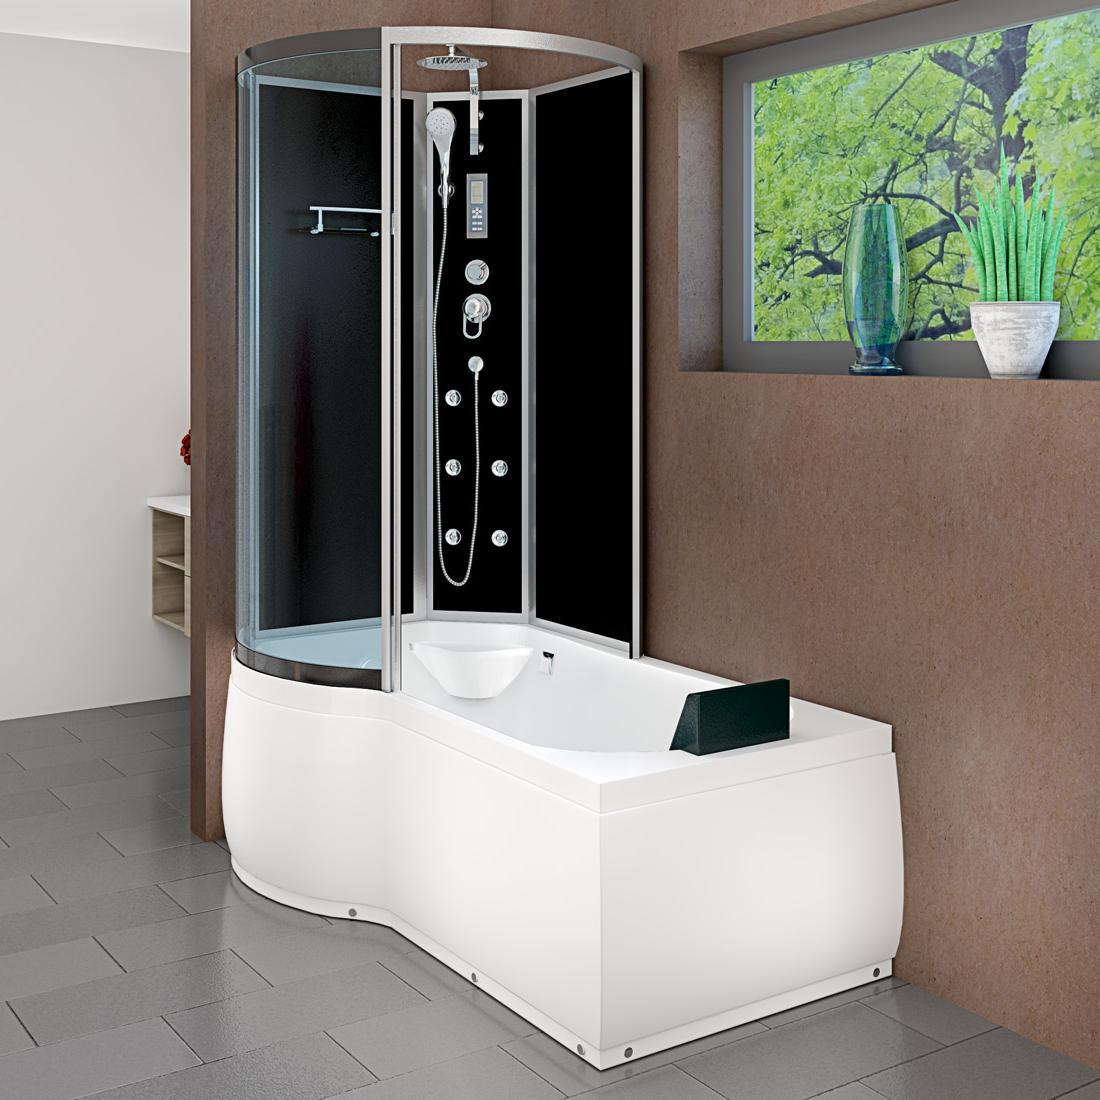 acquavapore dtp8050 a301r wanne duschtempel badewanne dusche duschkabine 98x170 ebay. Black Bedroom Furniture Sets. Home Design Ideas